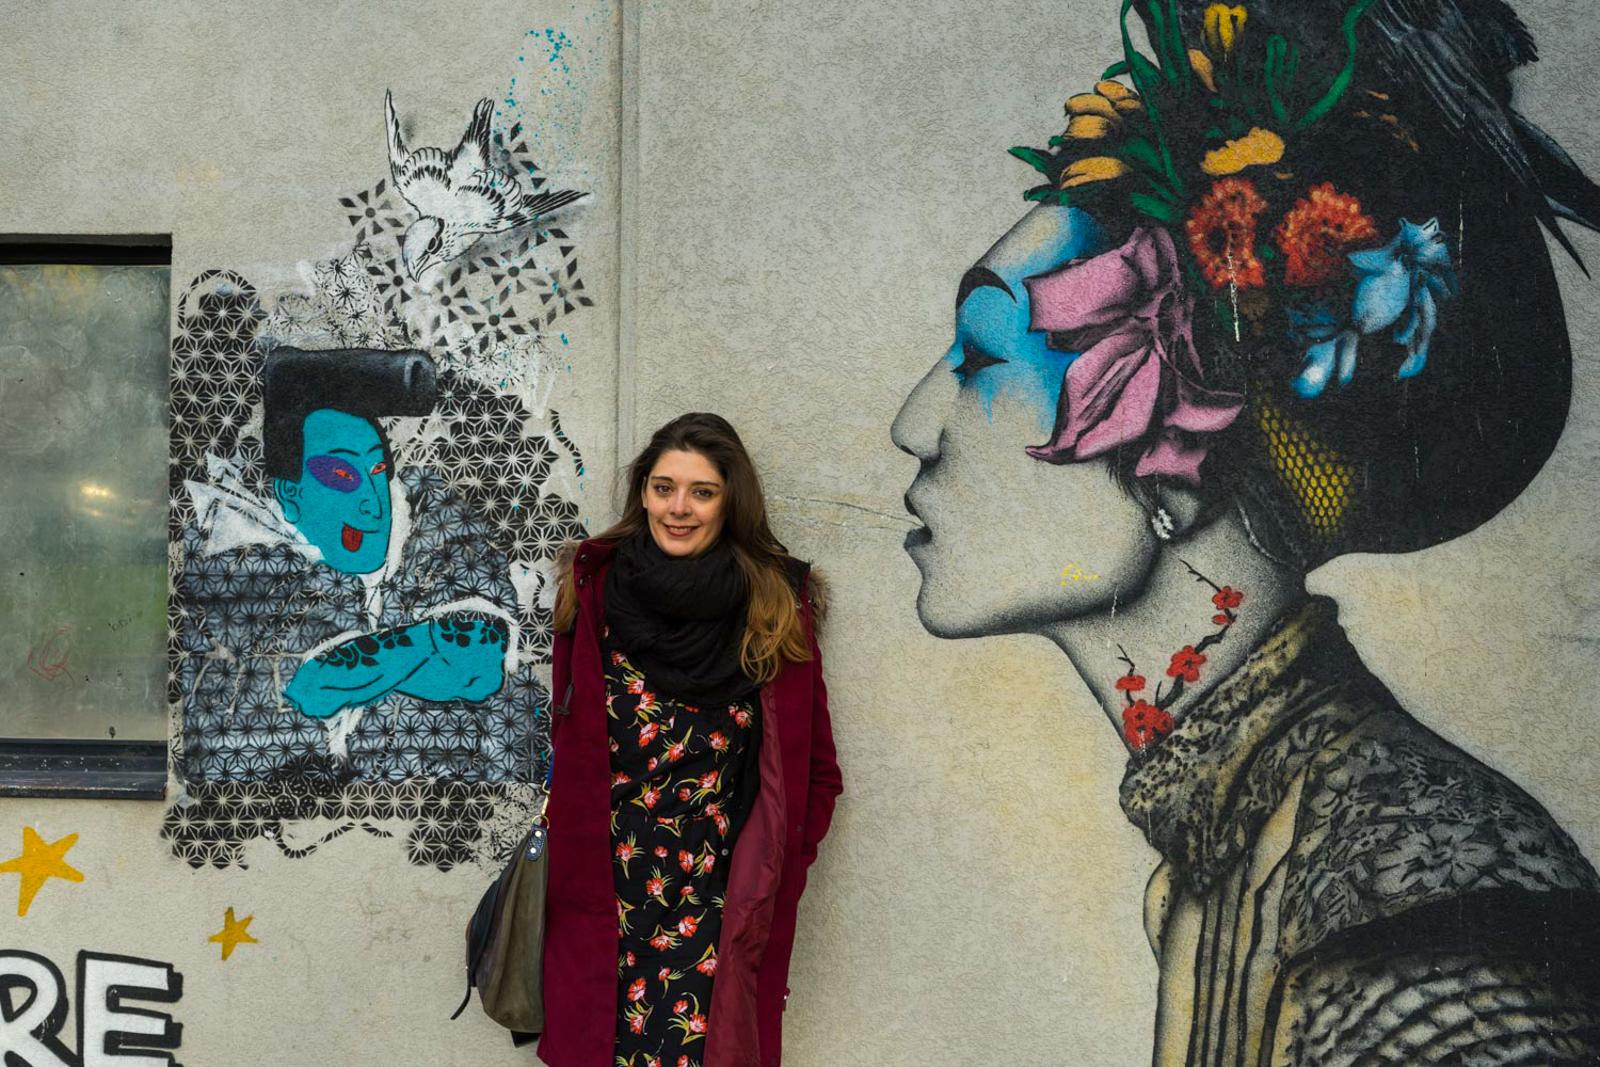 finbarr dac, street art vitry-sur-seine, street art vitry, street art val-de-marne, street art banlieue paris, art urbain vitry, art urbain vitry-sur-seine, art urbain vitry, le guide du street art à paris, stéphanie lombard